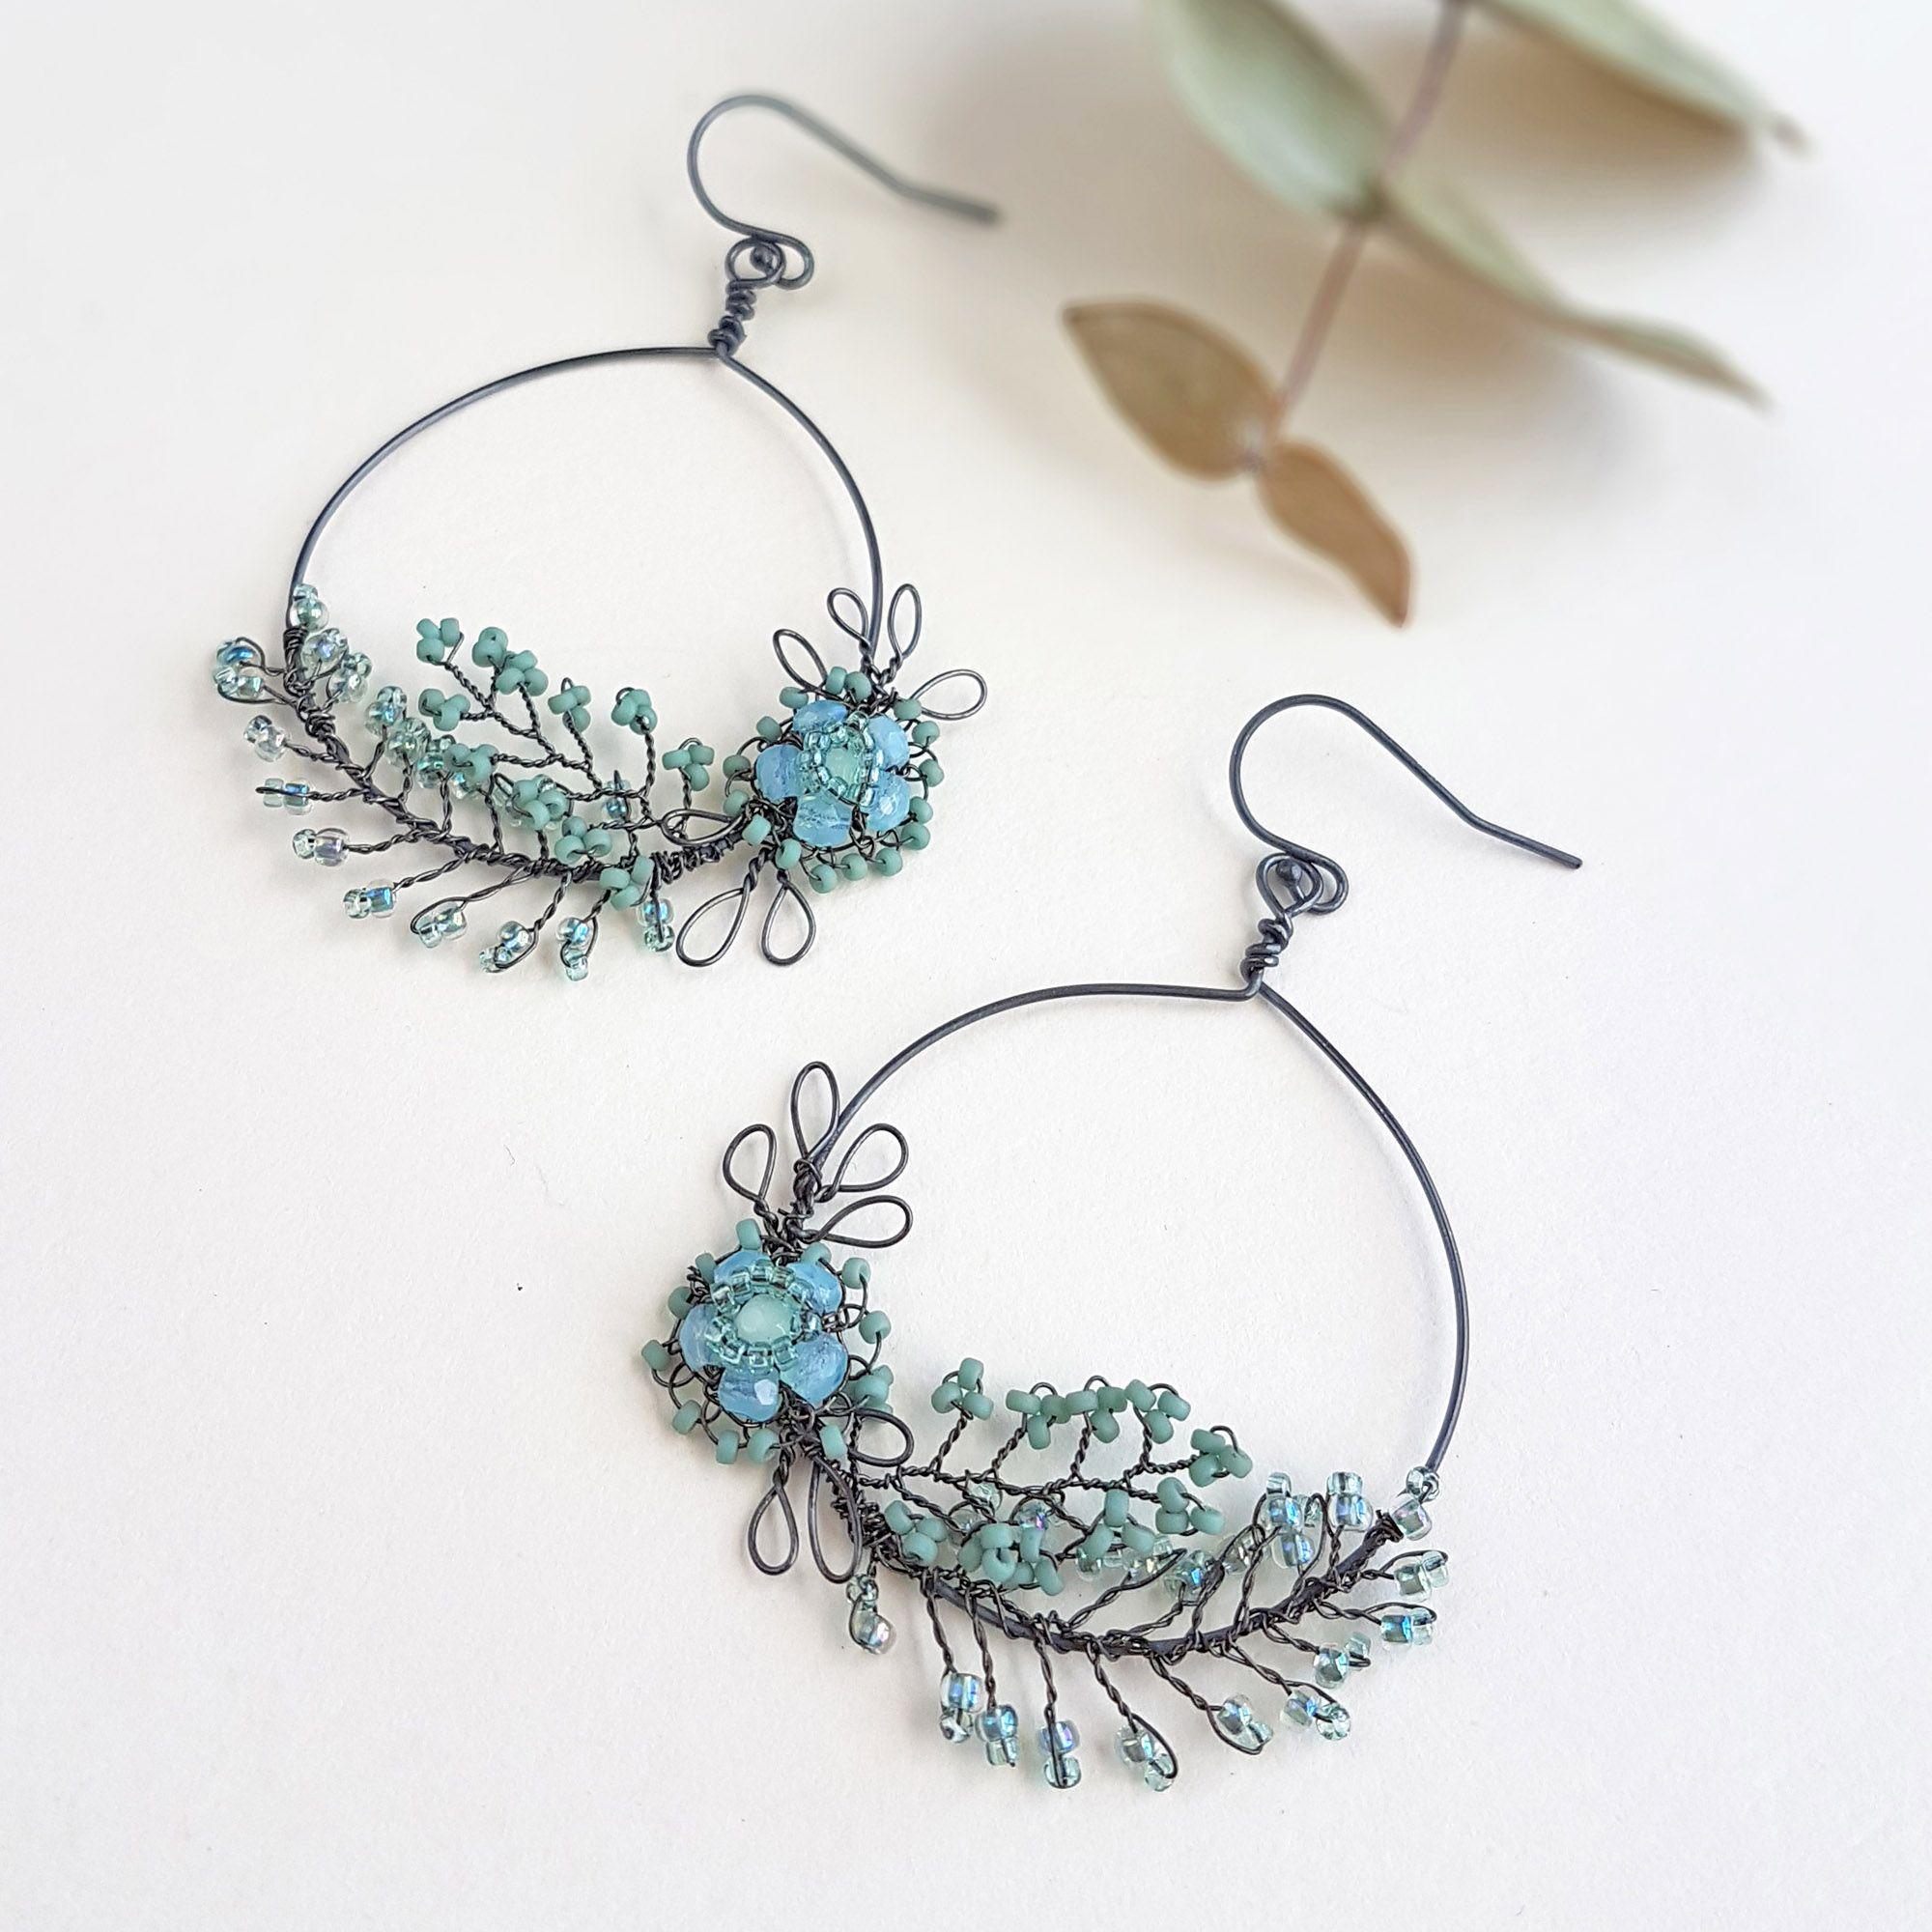 Garland statement earrings by Judith Brown Jewellery